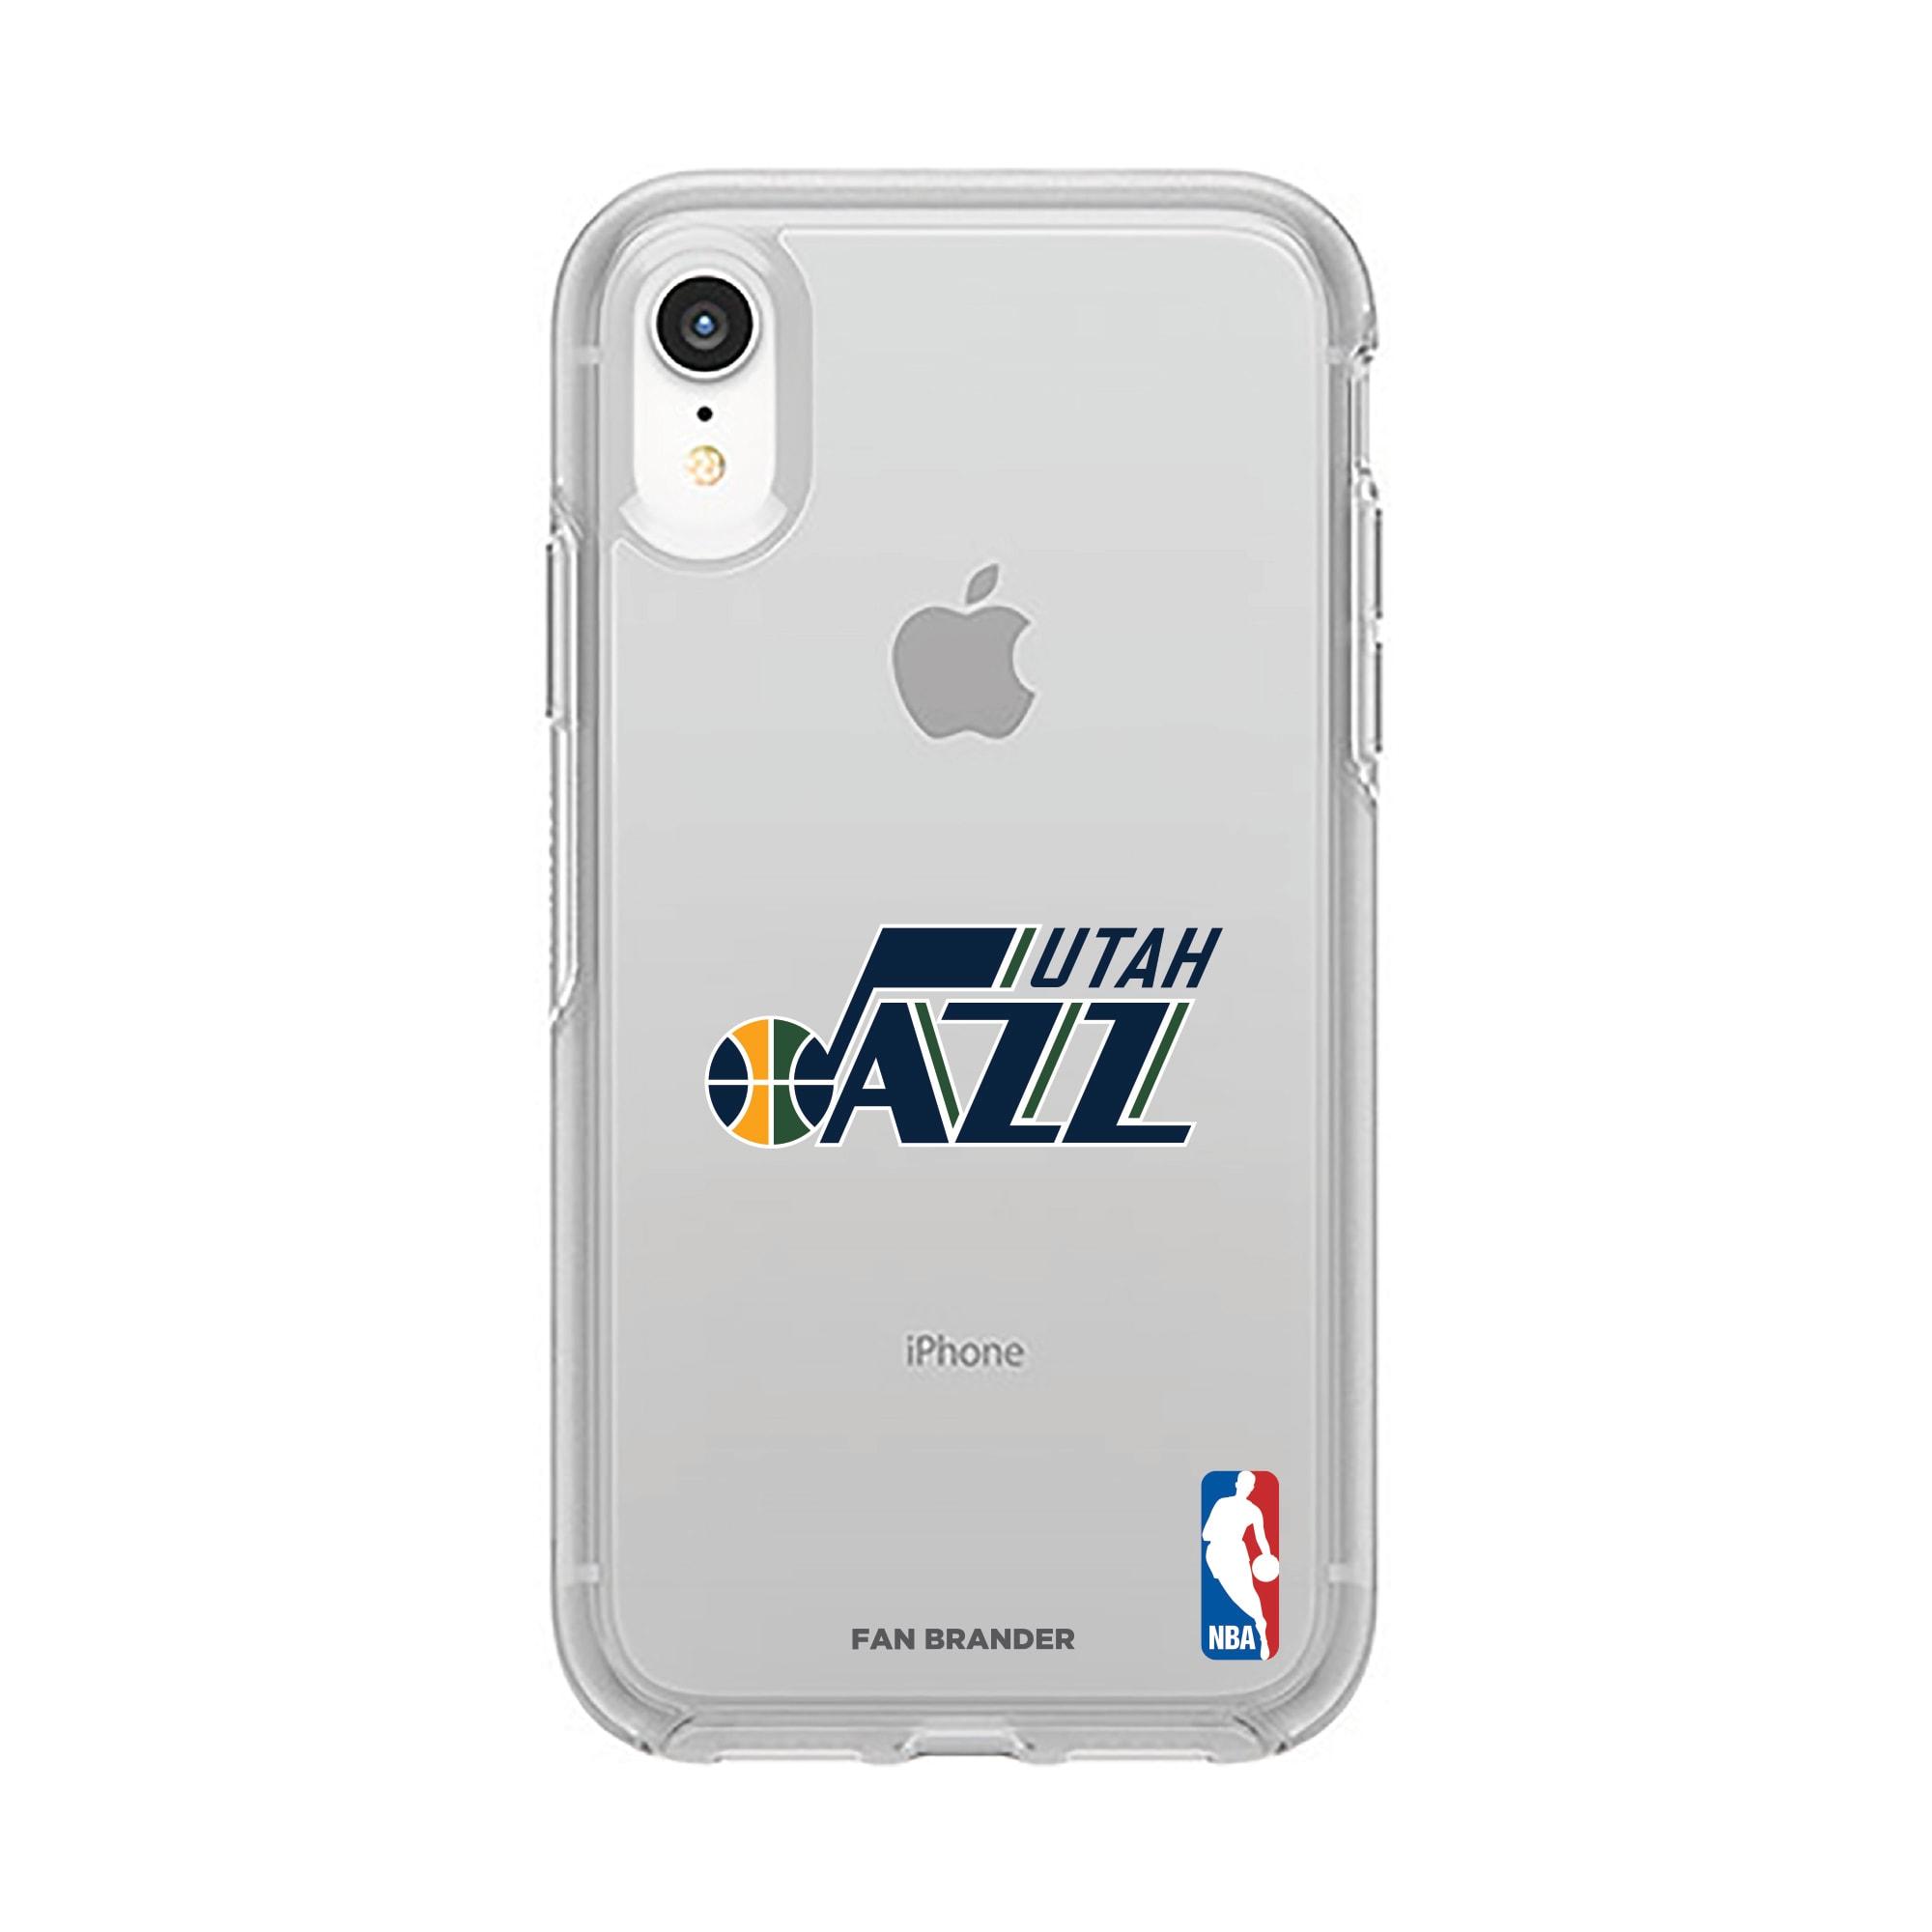 Utah Jazz OtterBox Clear Primary Logo iPhone Case